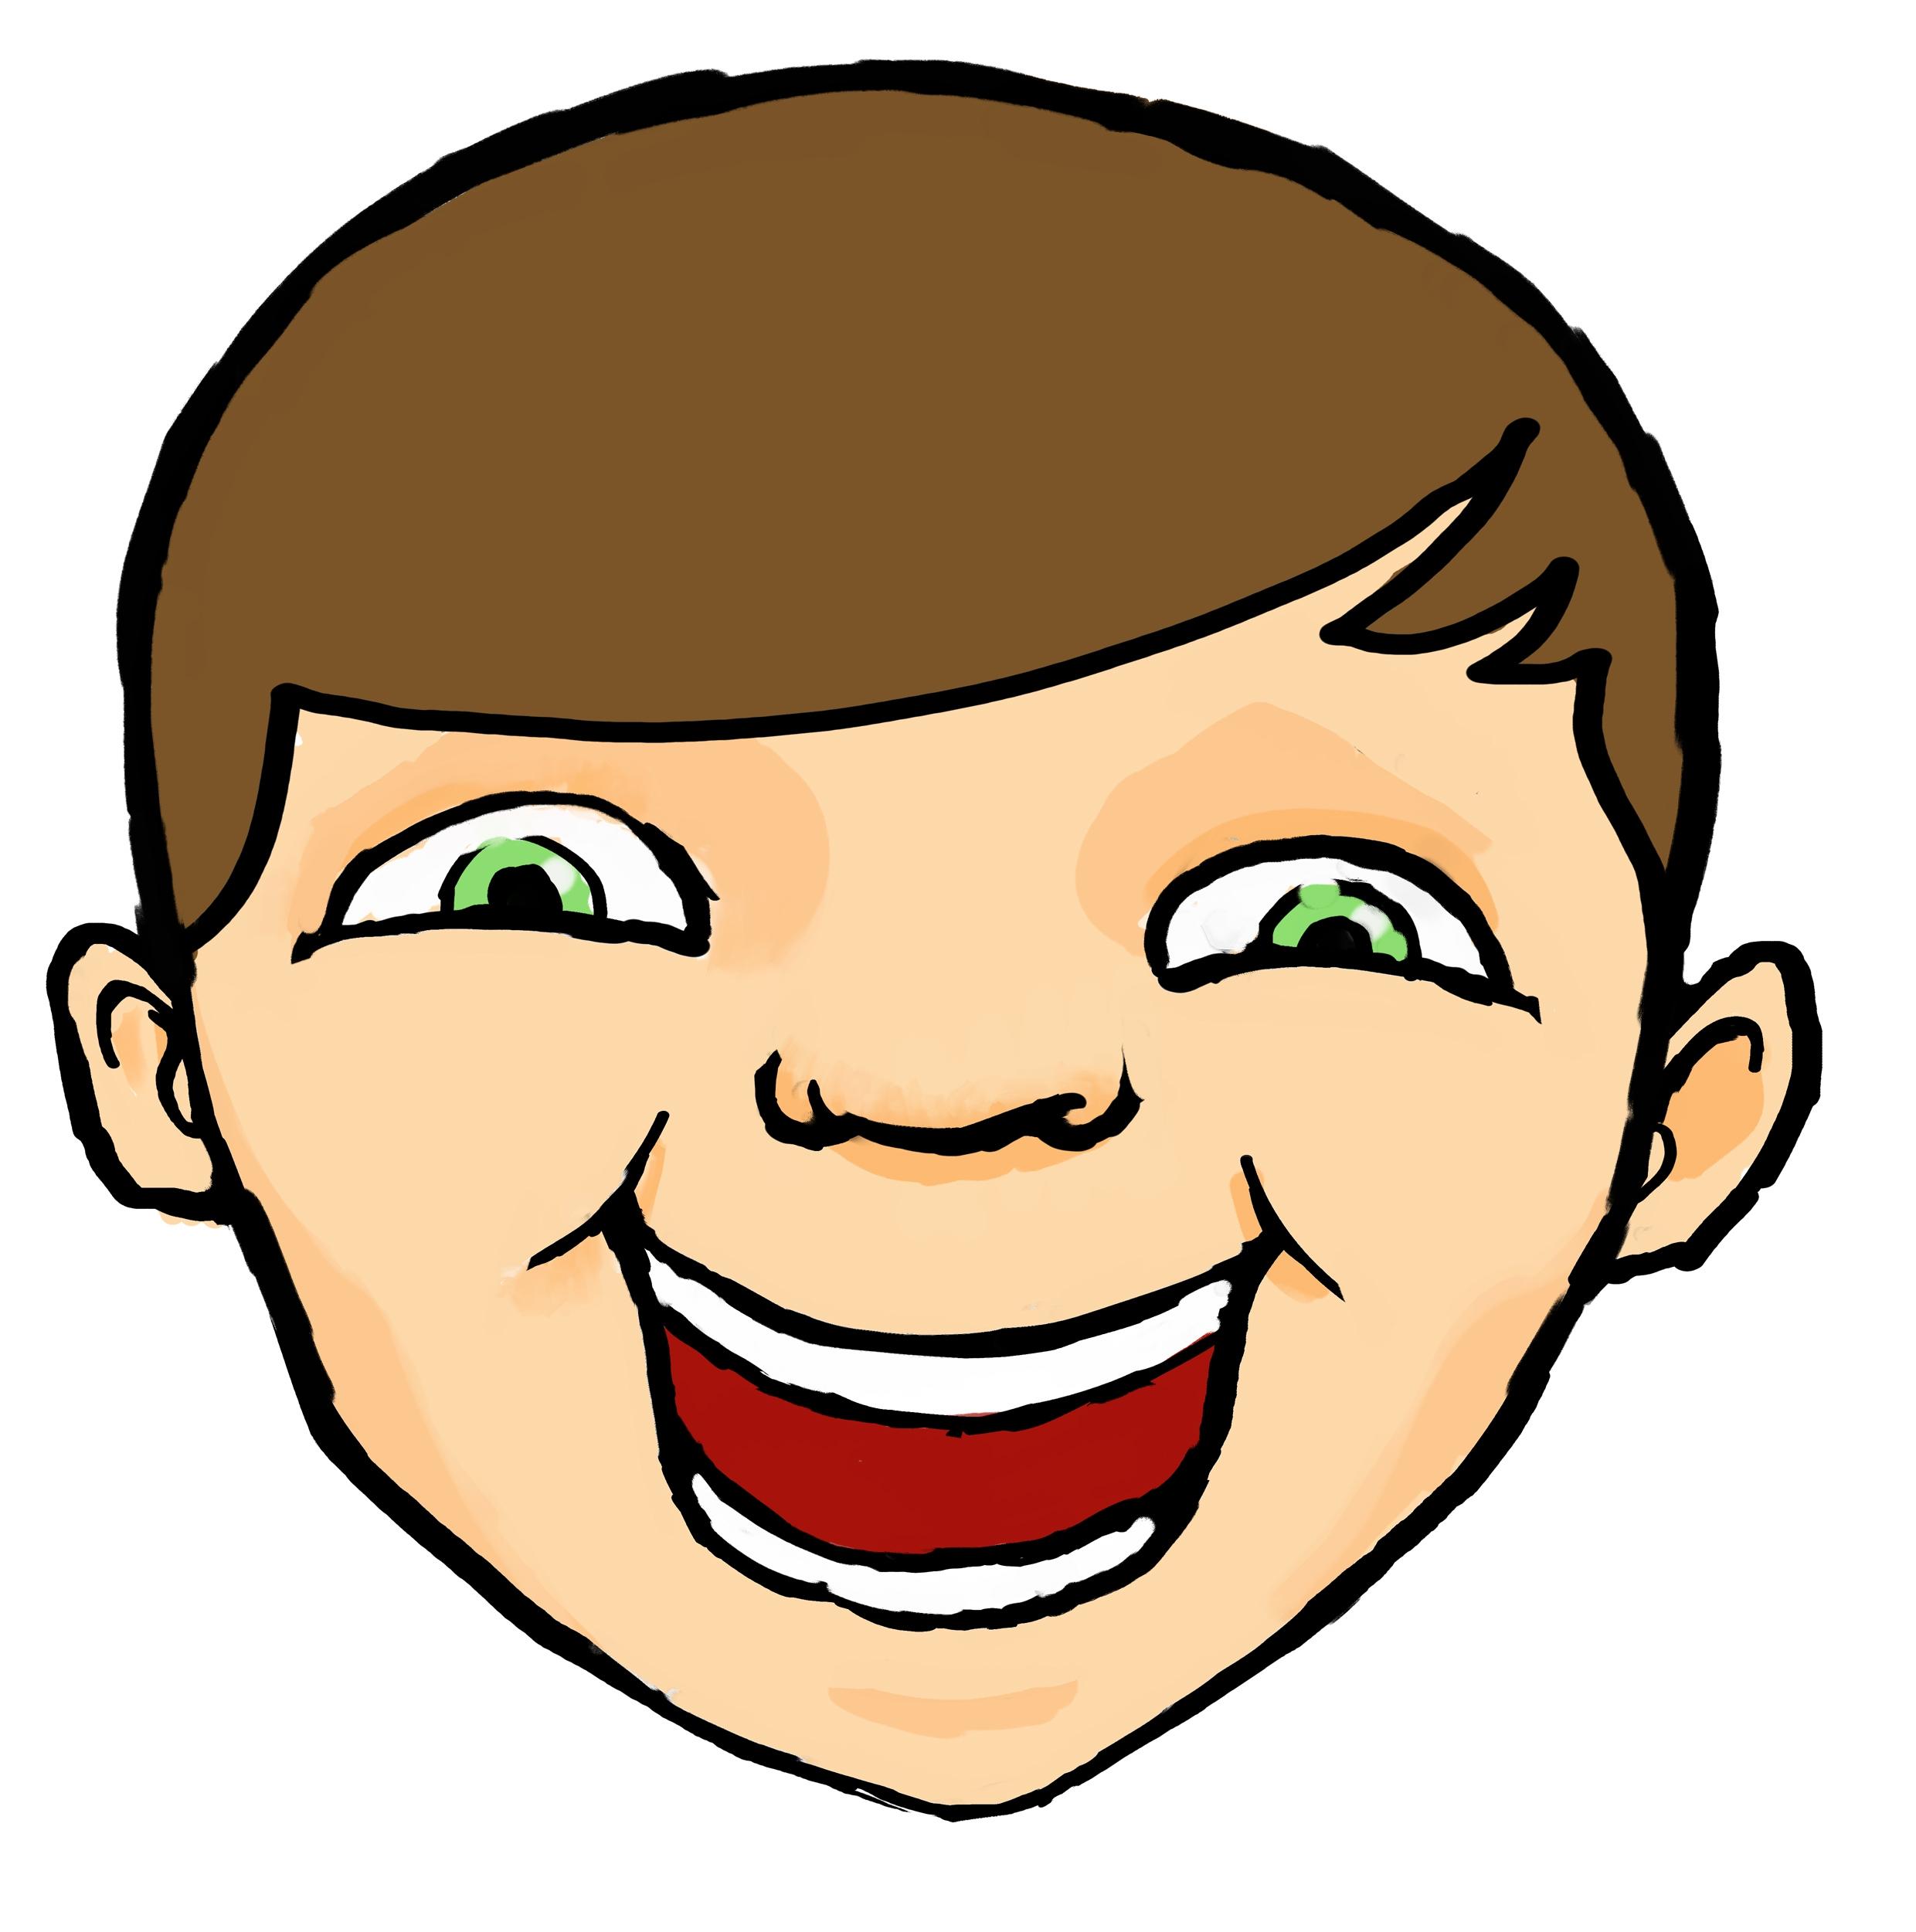 Chin clipart kid. Cartoon boy face free